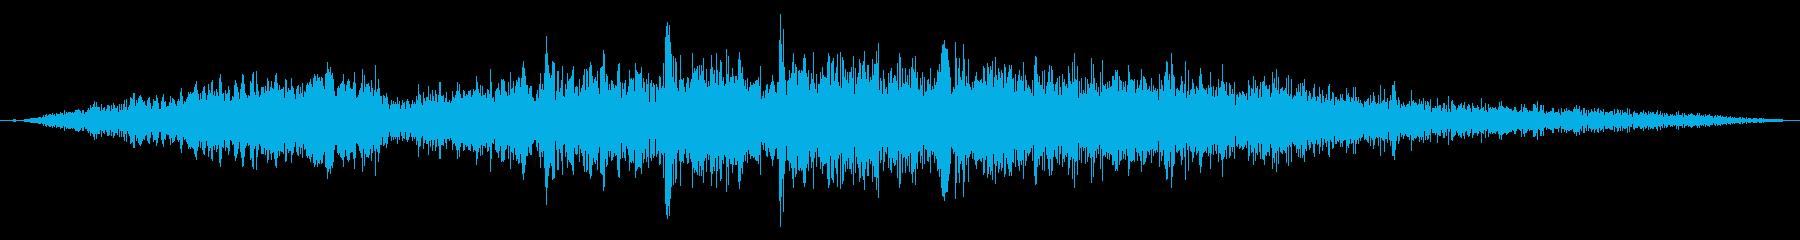 【F1】超ド迫力のF1エンジン効果音8!の再生済みの波形